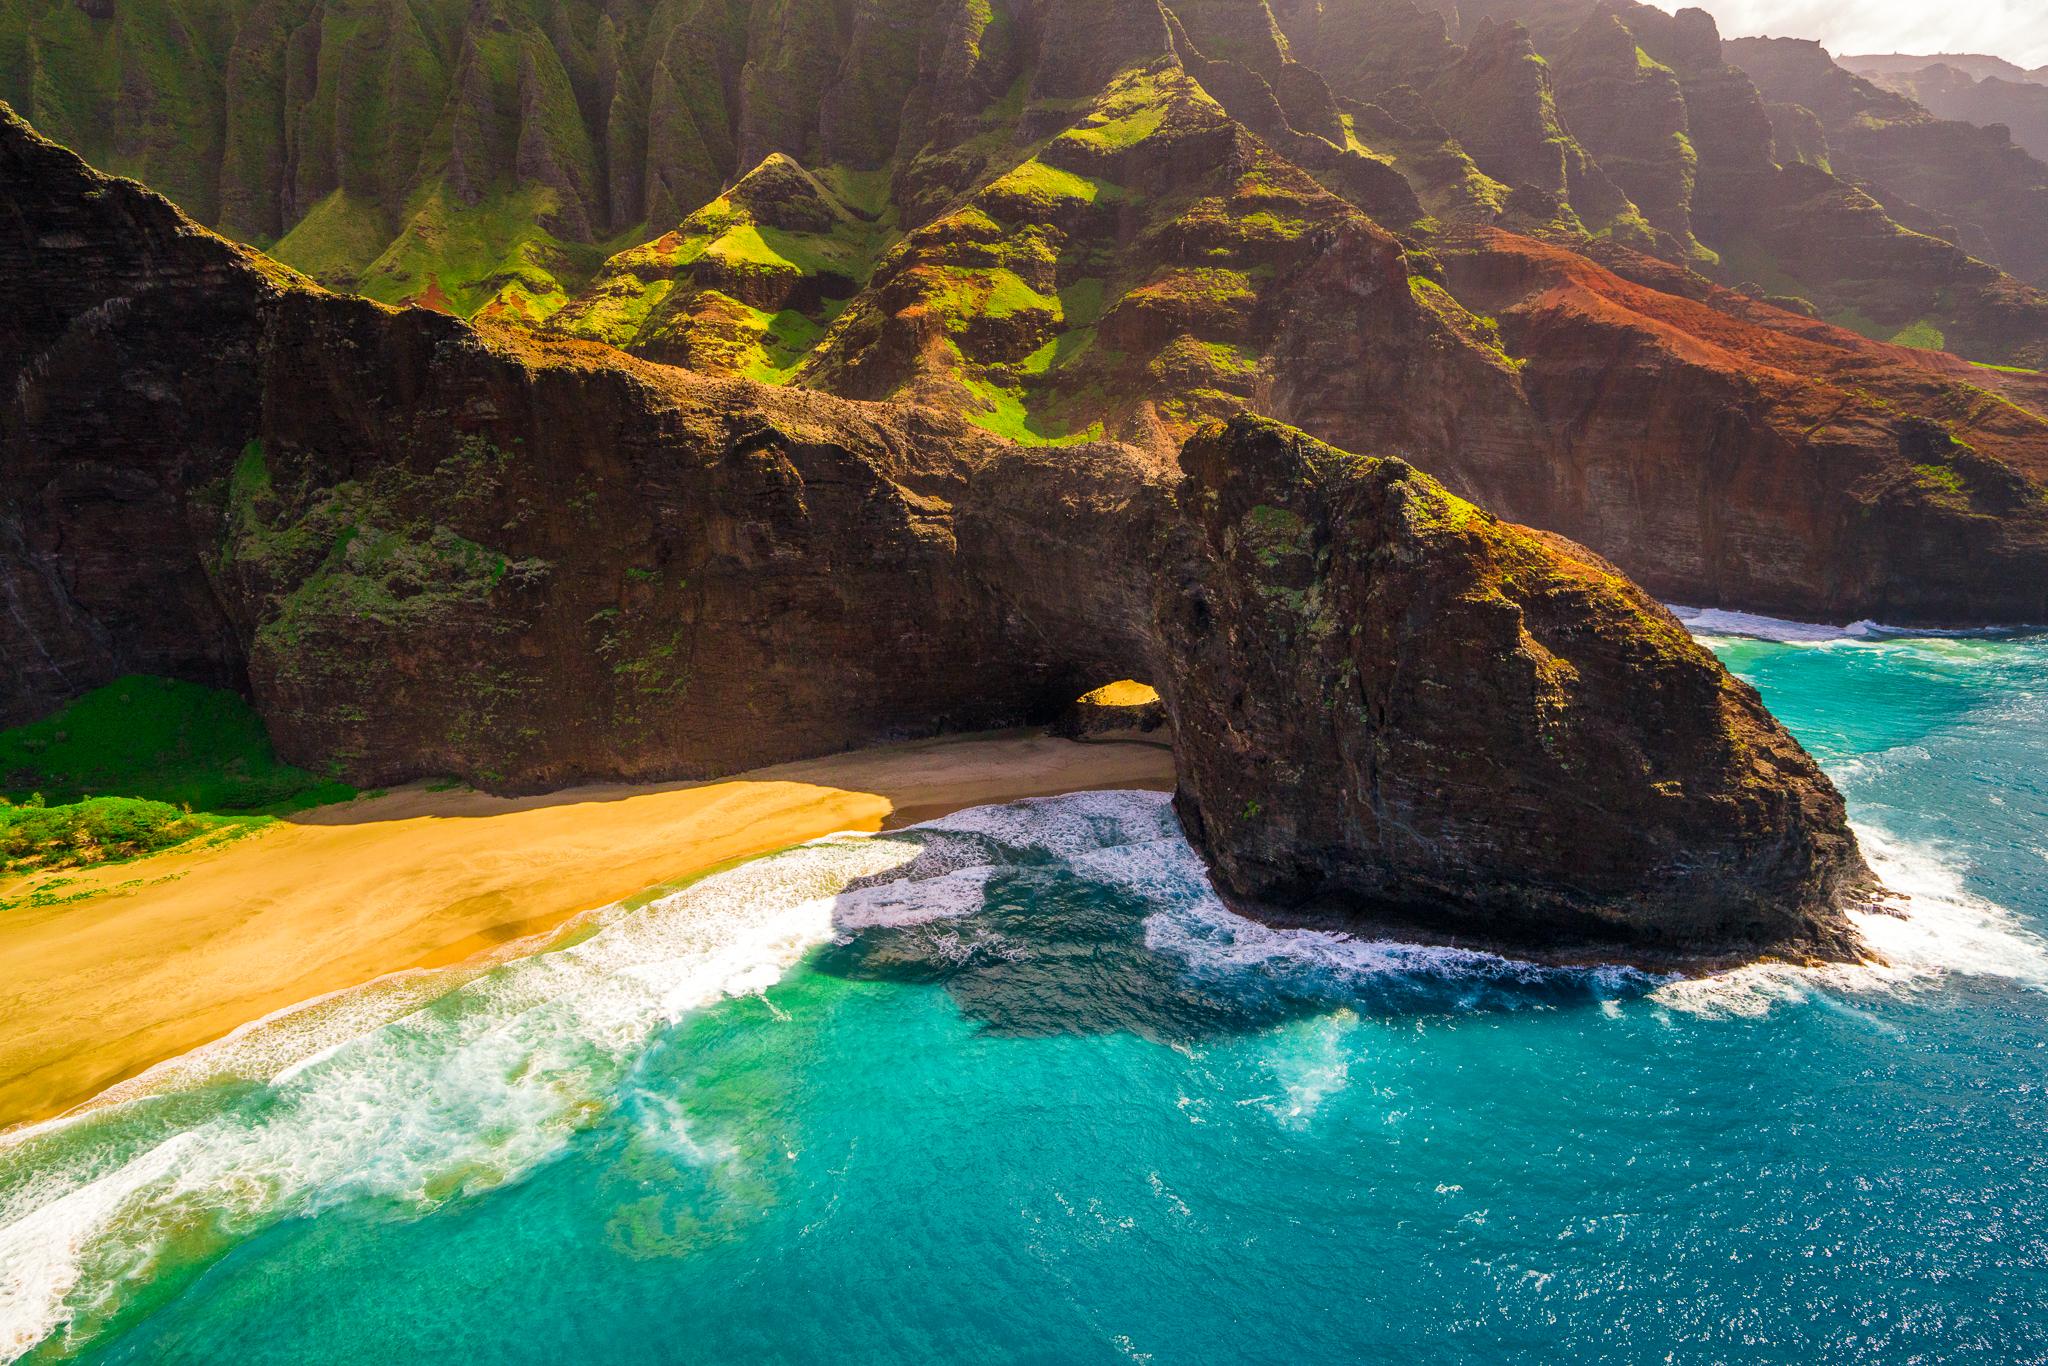 a bird's eye view of the famous napali coast of kauai, hawaii taken